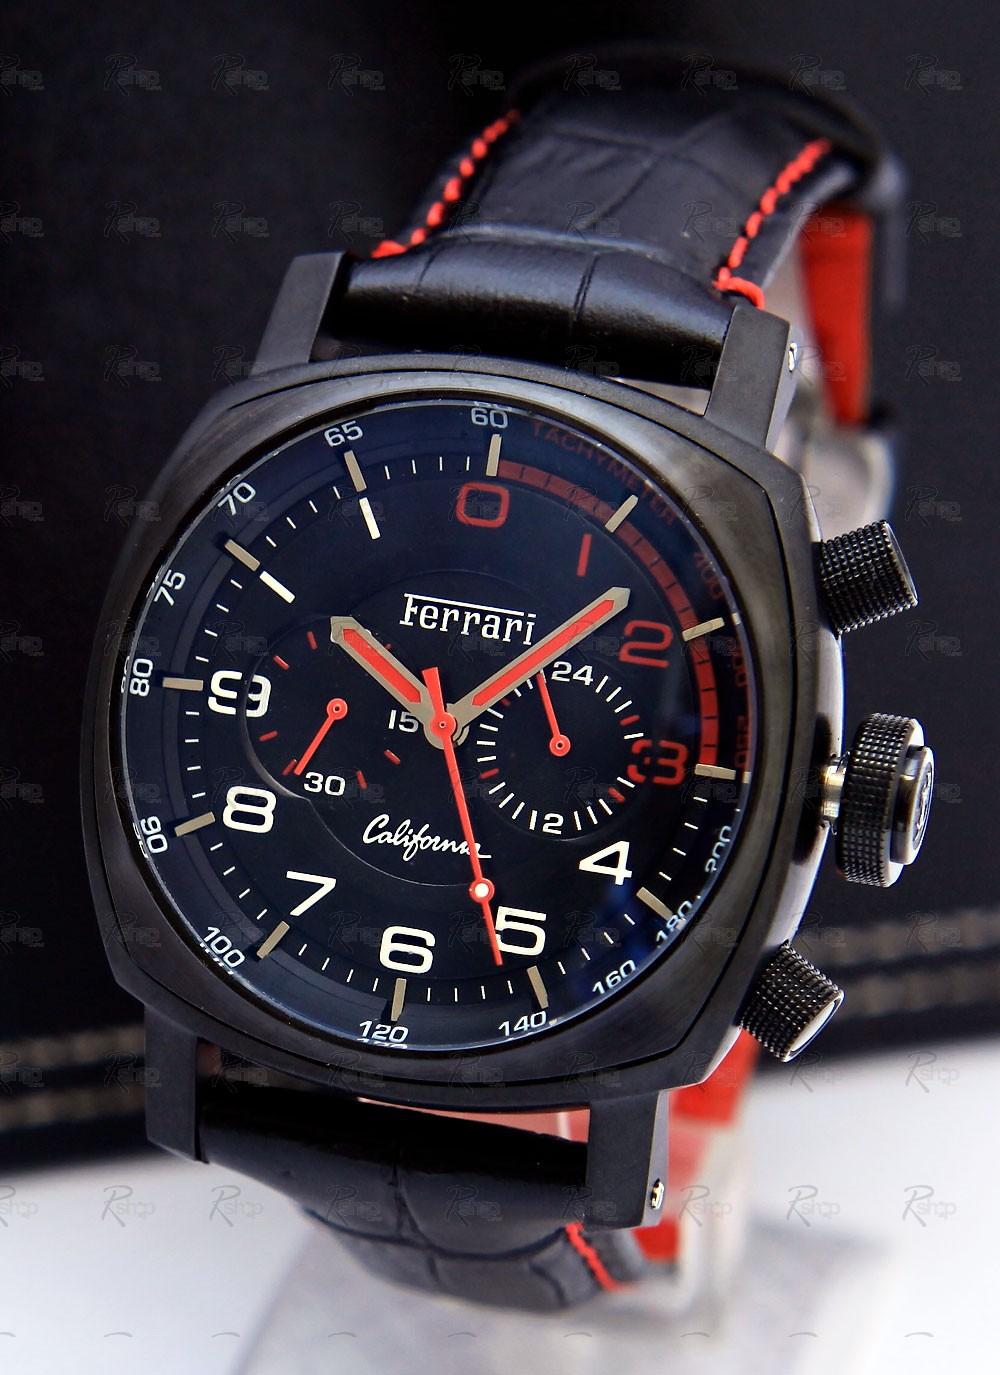 officine_panerai_ferrari_california_flyback_chronograph_watch.jpg